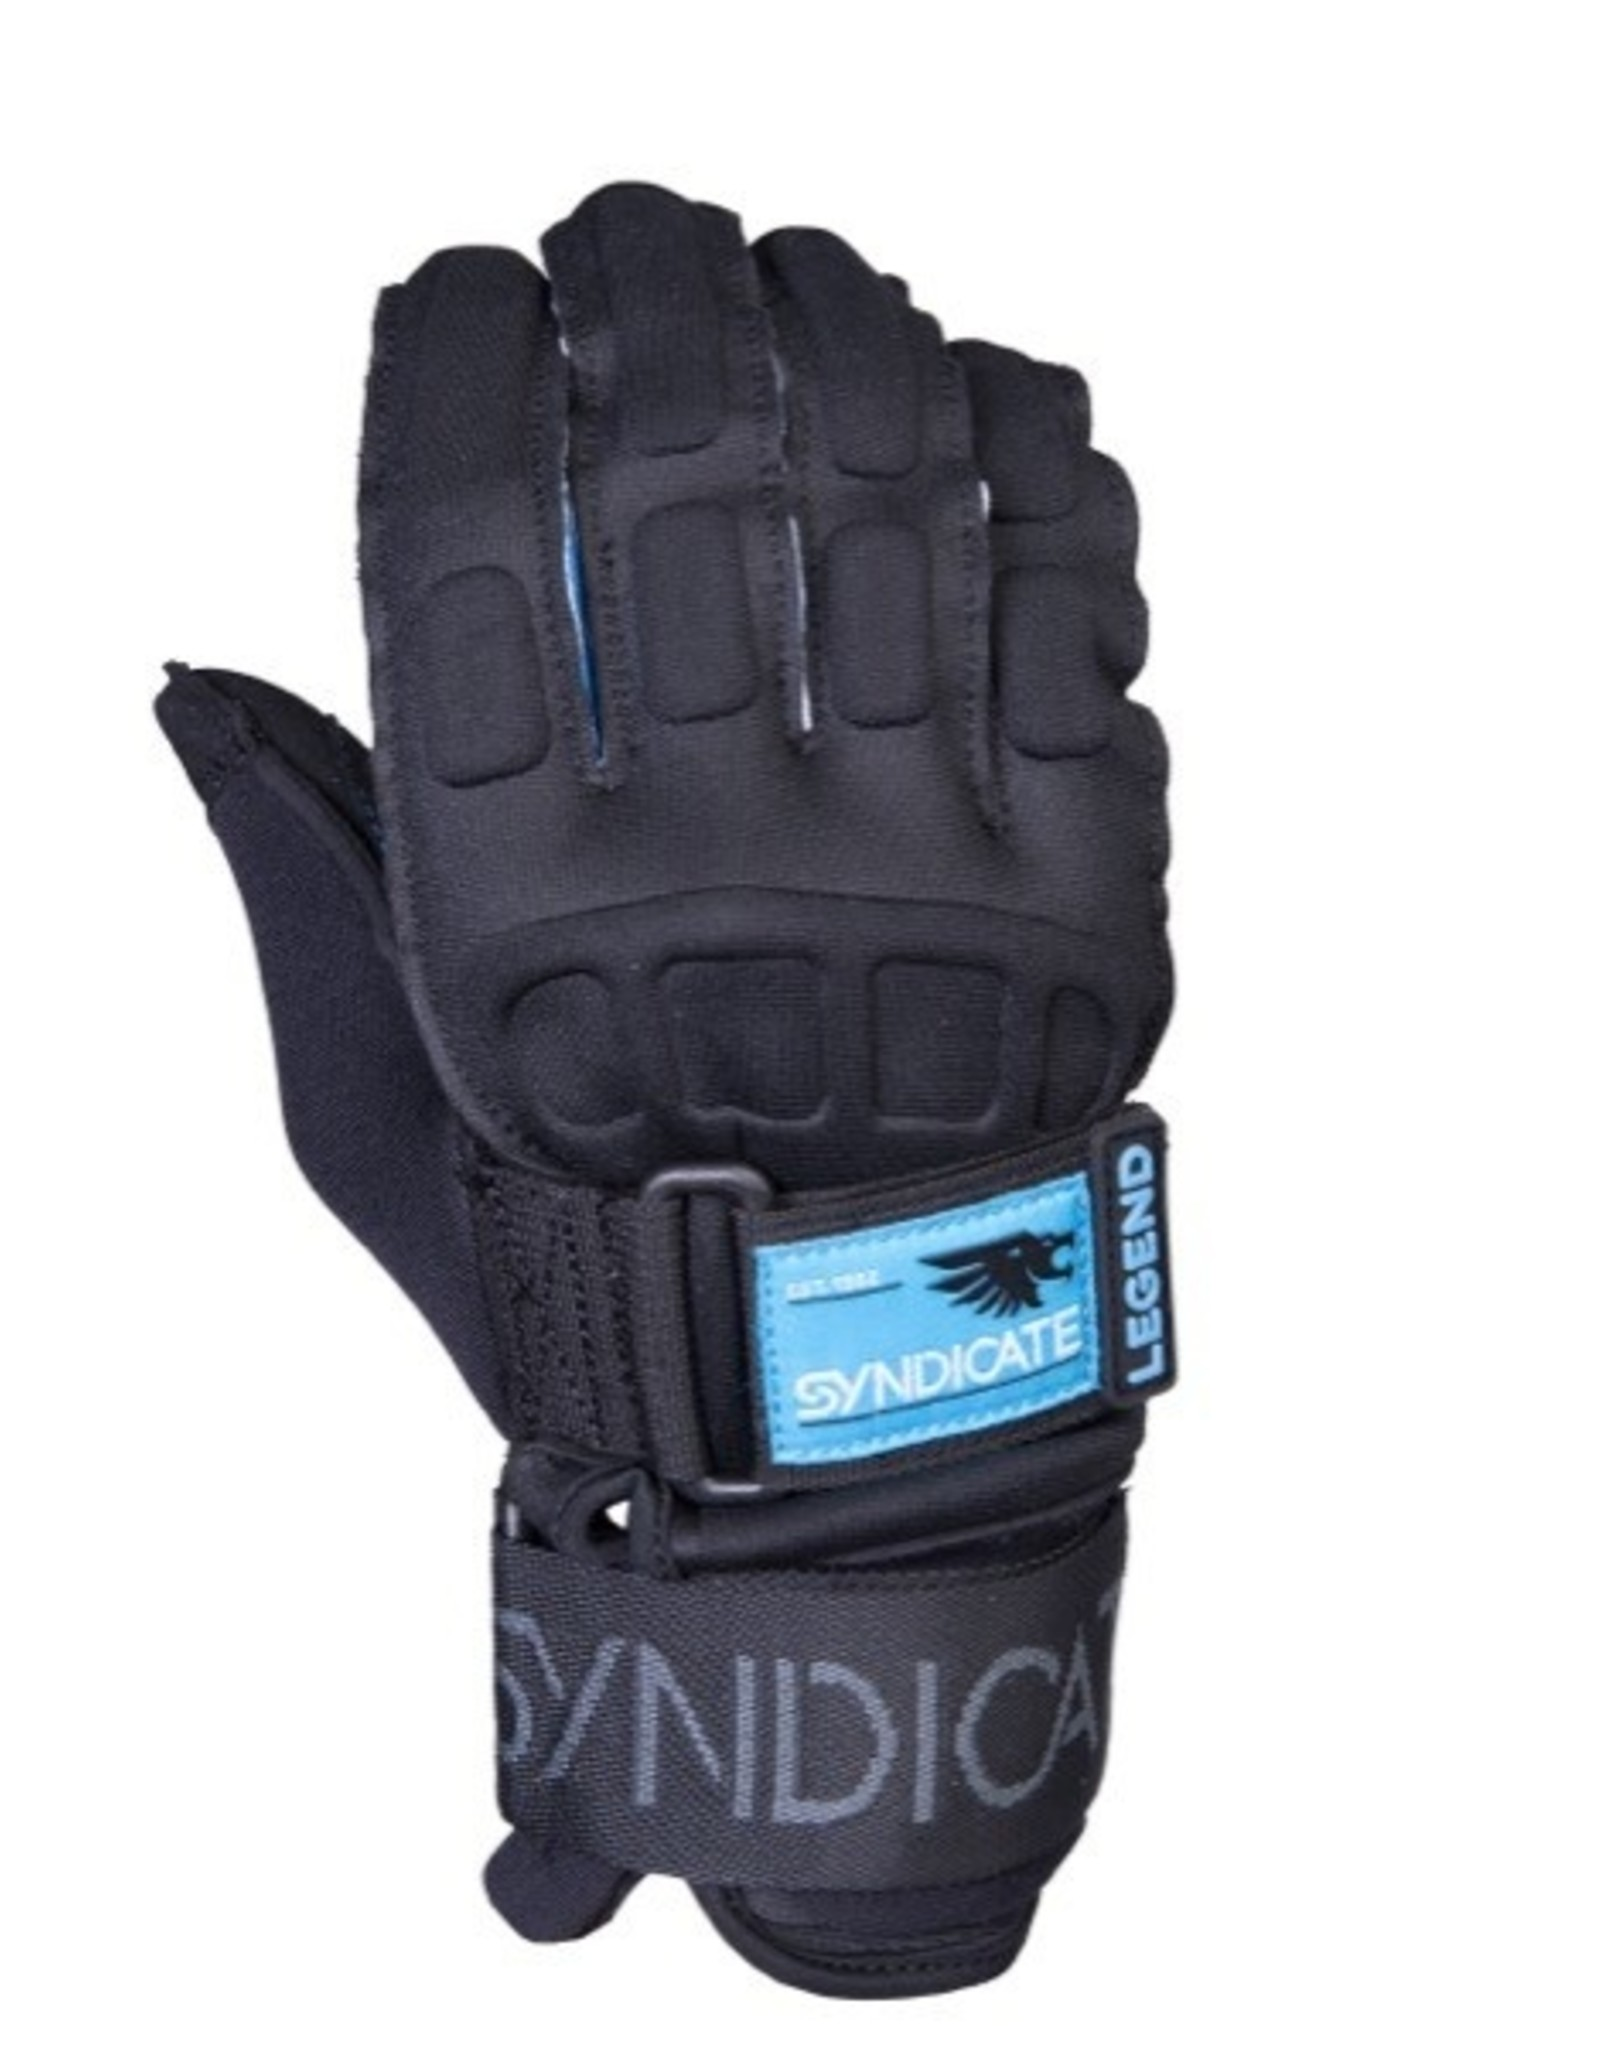 HO/Hyperlite Syndicate Legend Inside Out Glove 2019